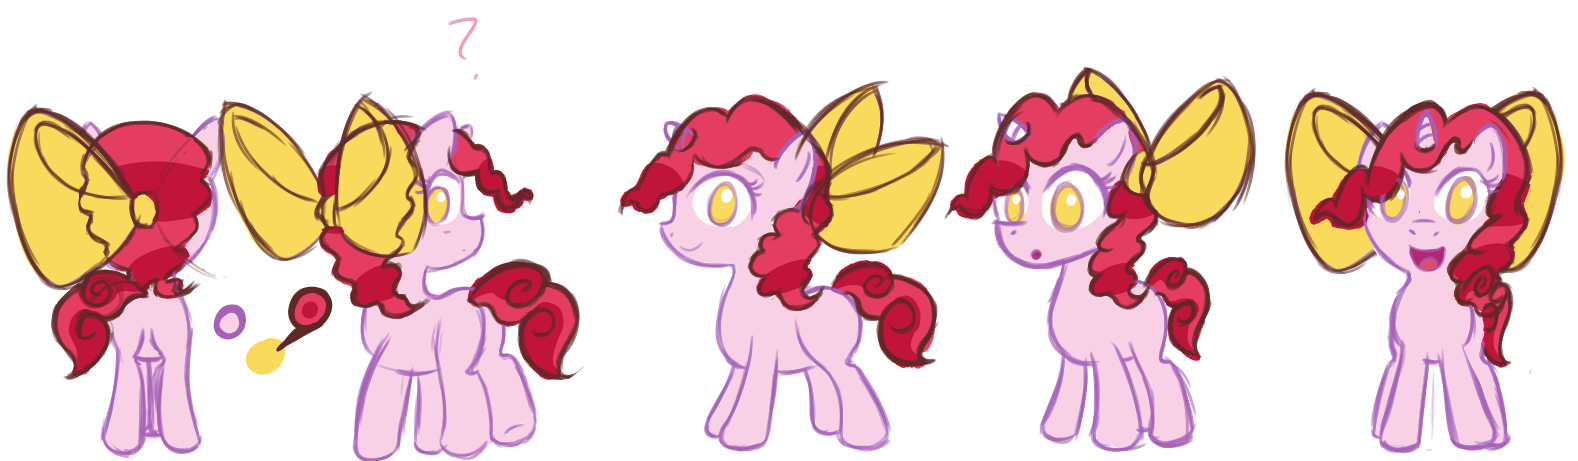 Berry Pop